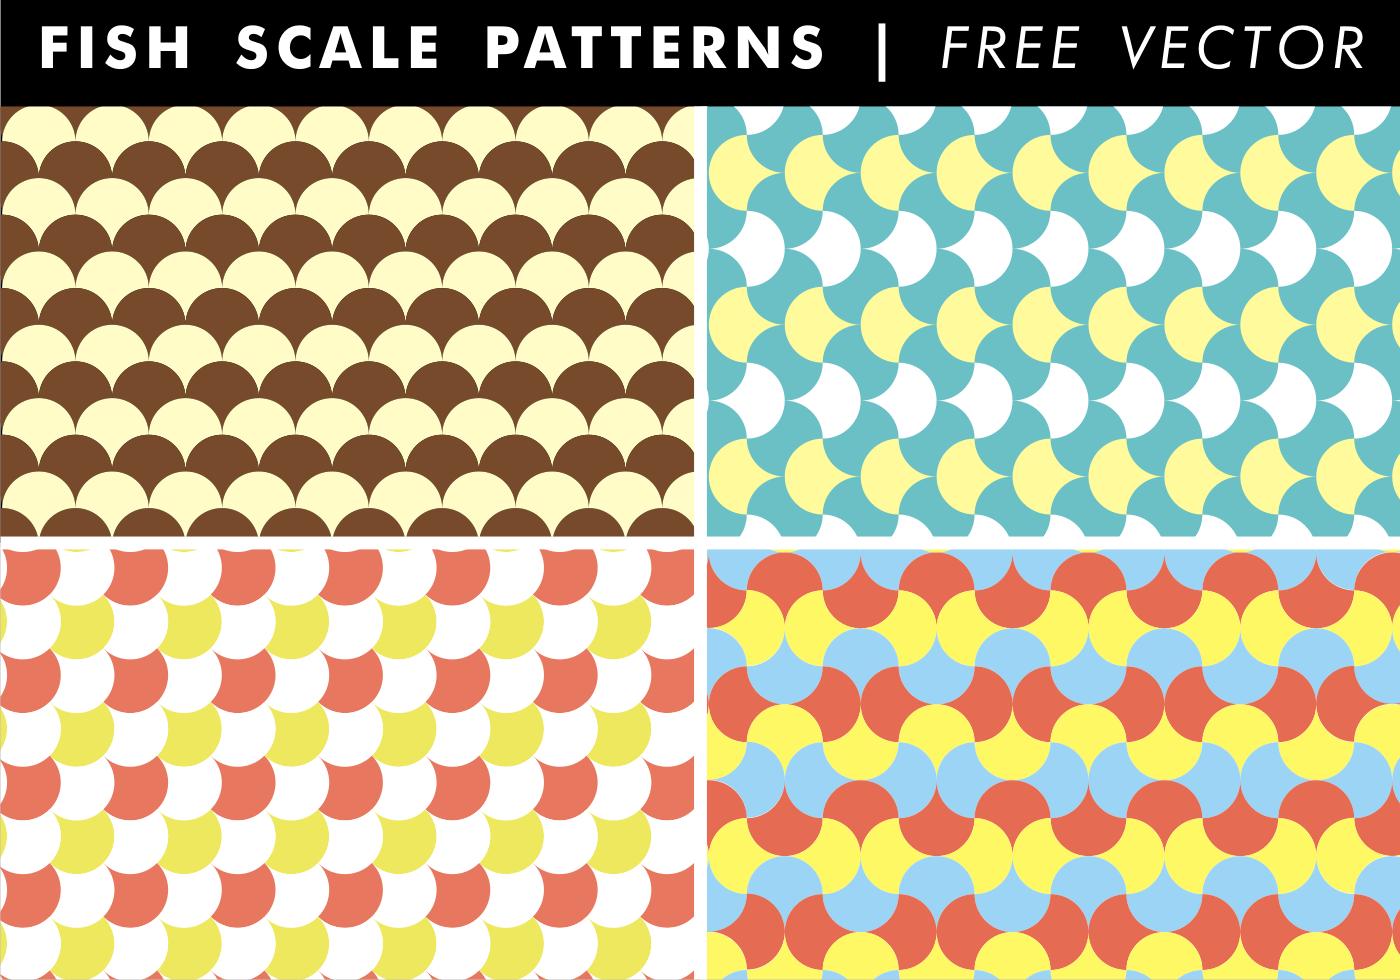 Wallpaper Pink Girl Cartoon Fish Scale Patterns Free Vector Download Free Vector Art